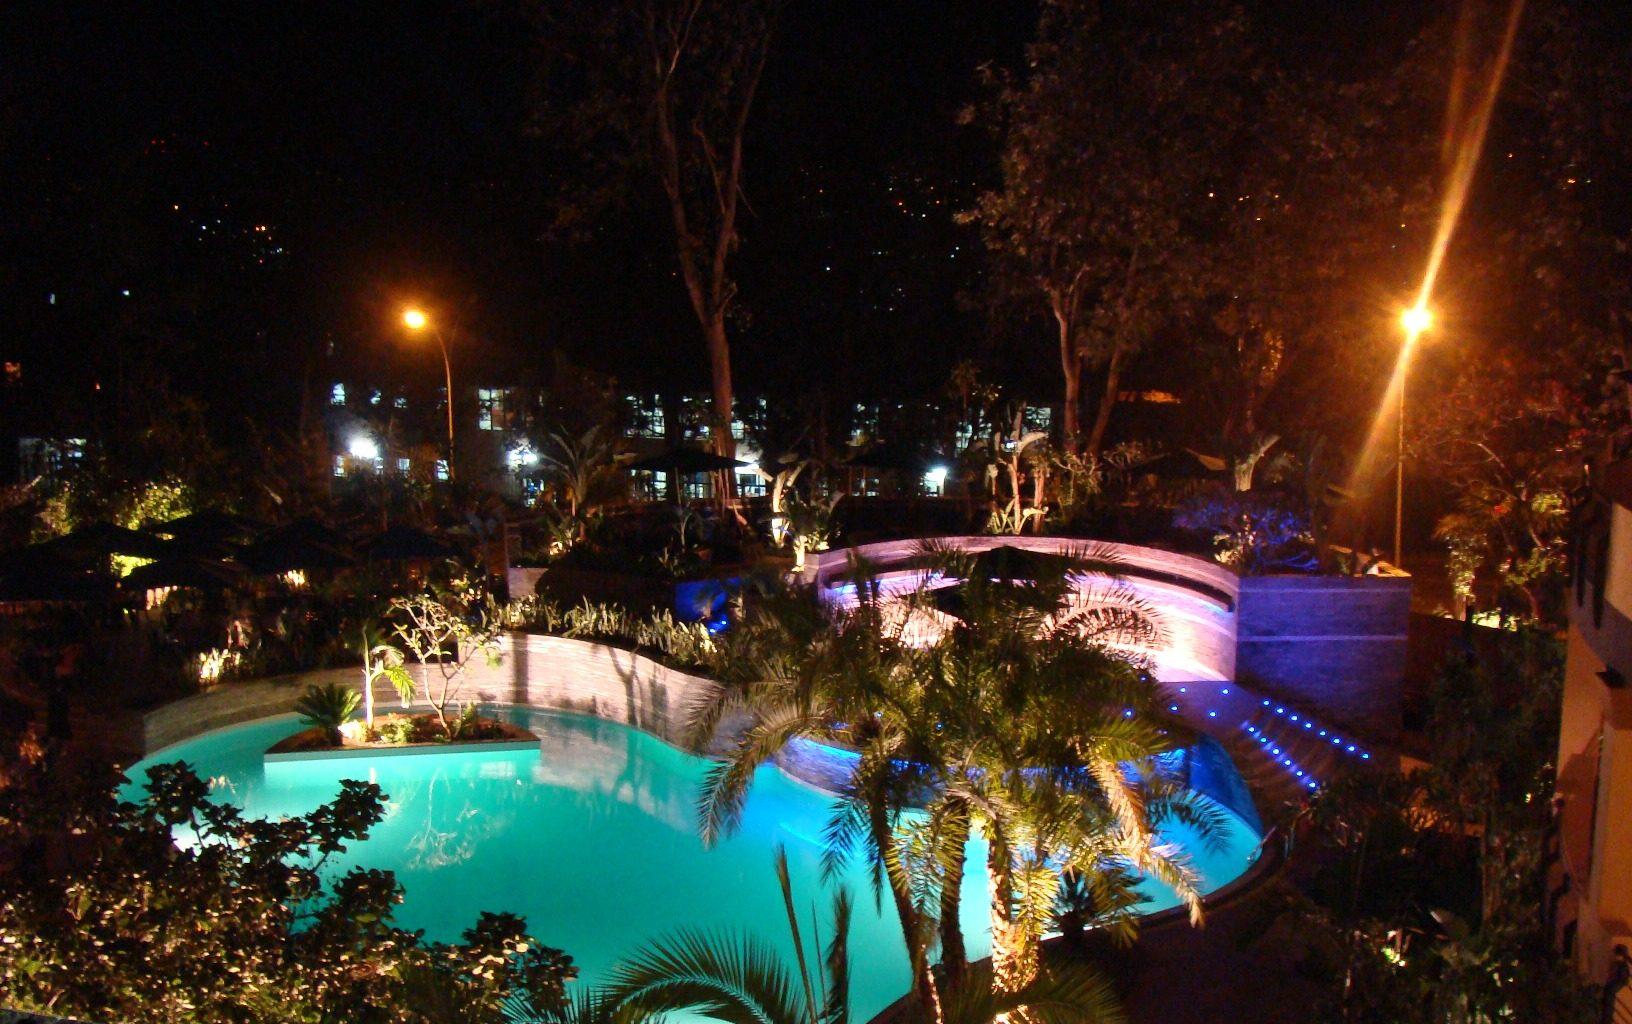 Kigali Serena Rwanda Pool Night